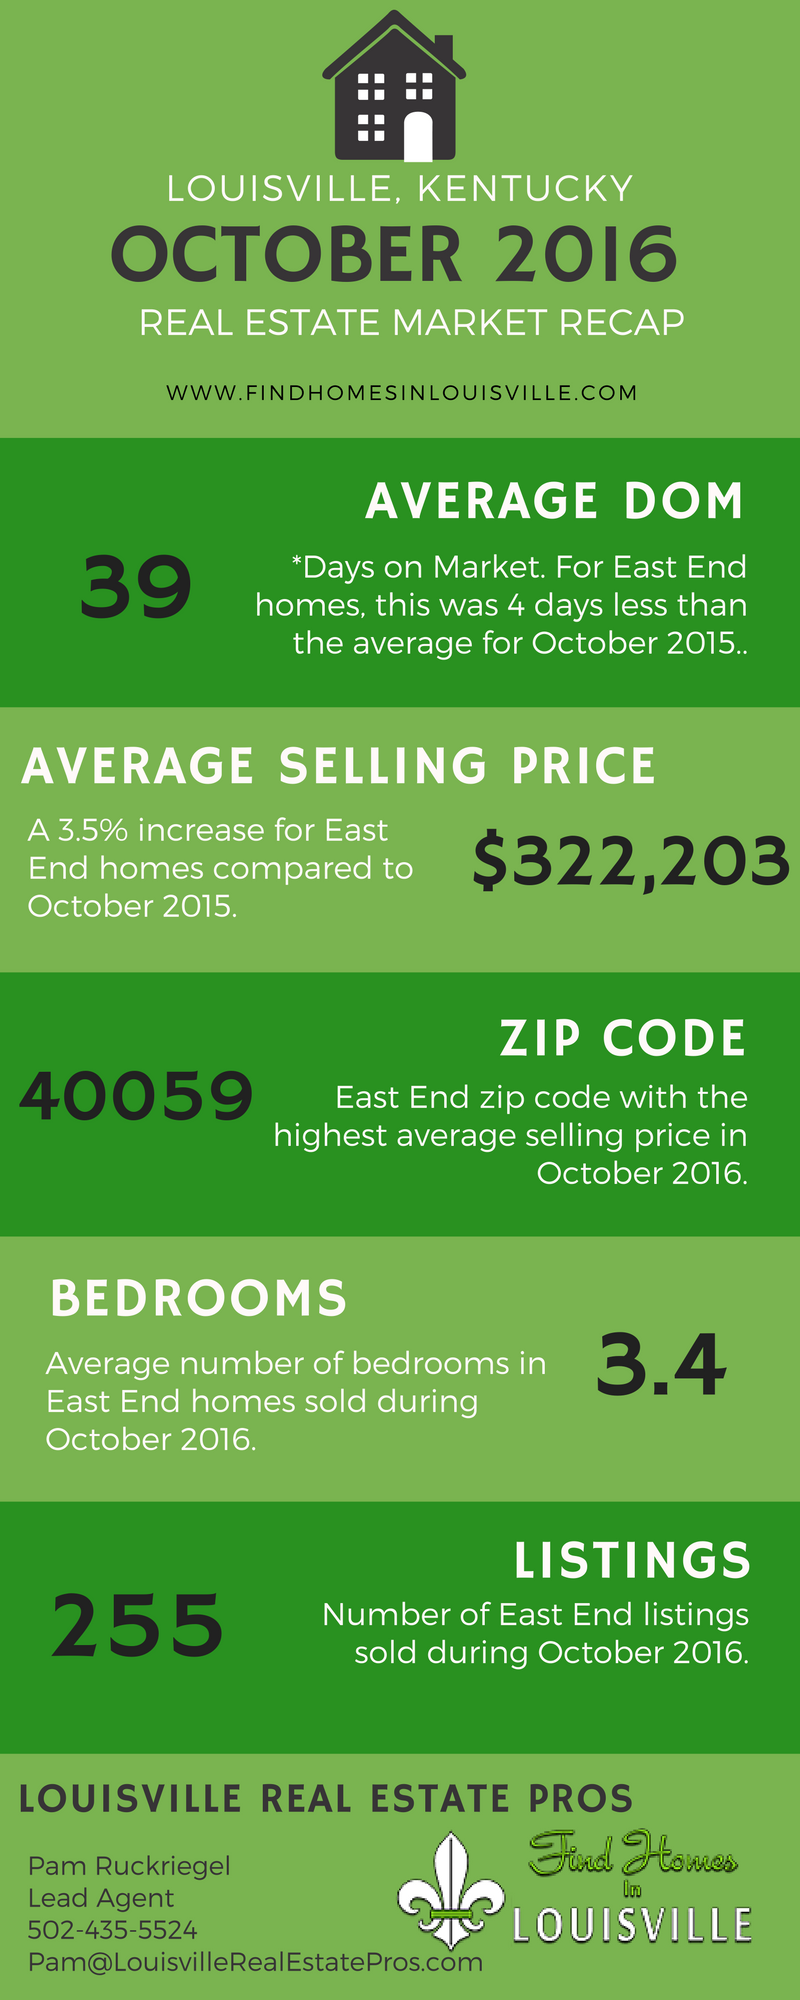 Louisville, KY Real Estate Market Recap - October 2016